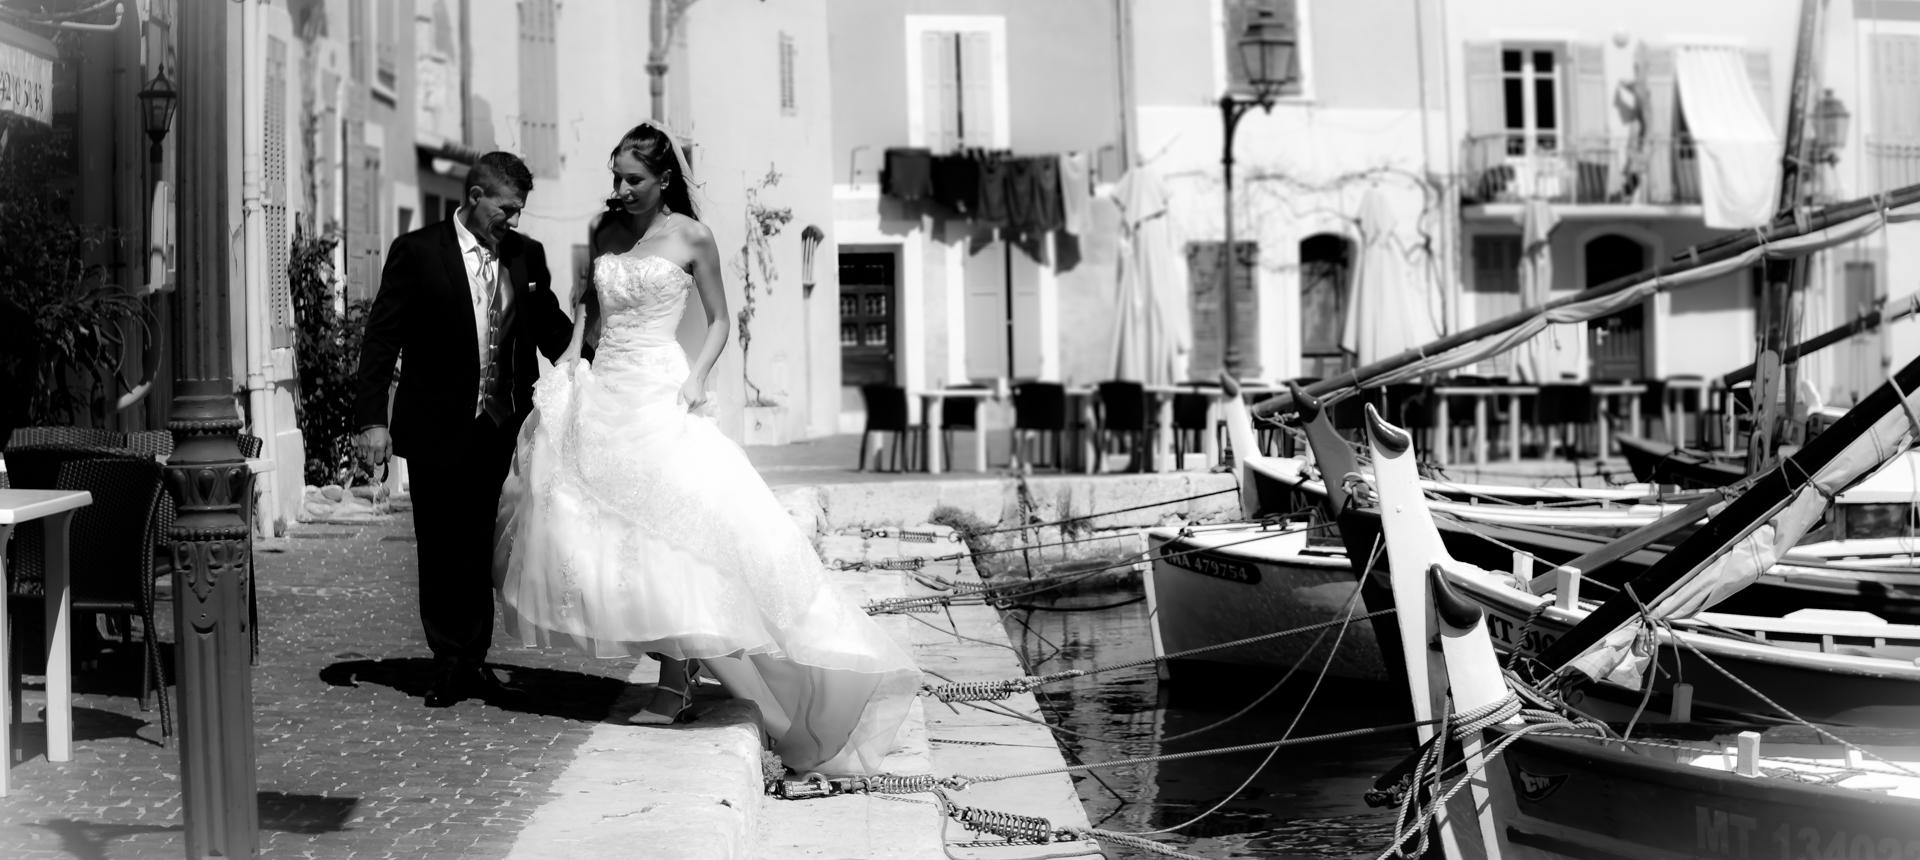 Wedding - Mathias PALTRIE-2